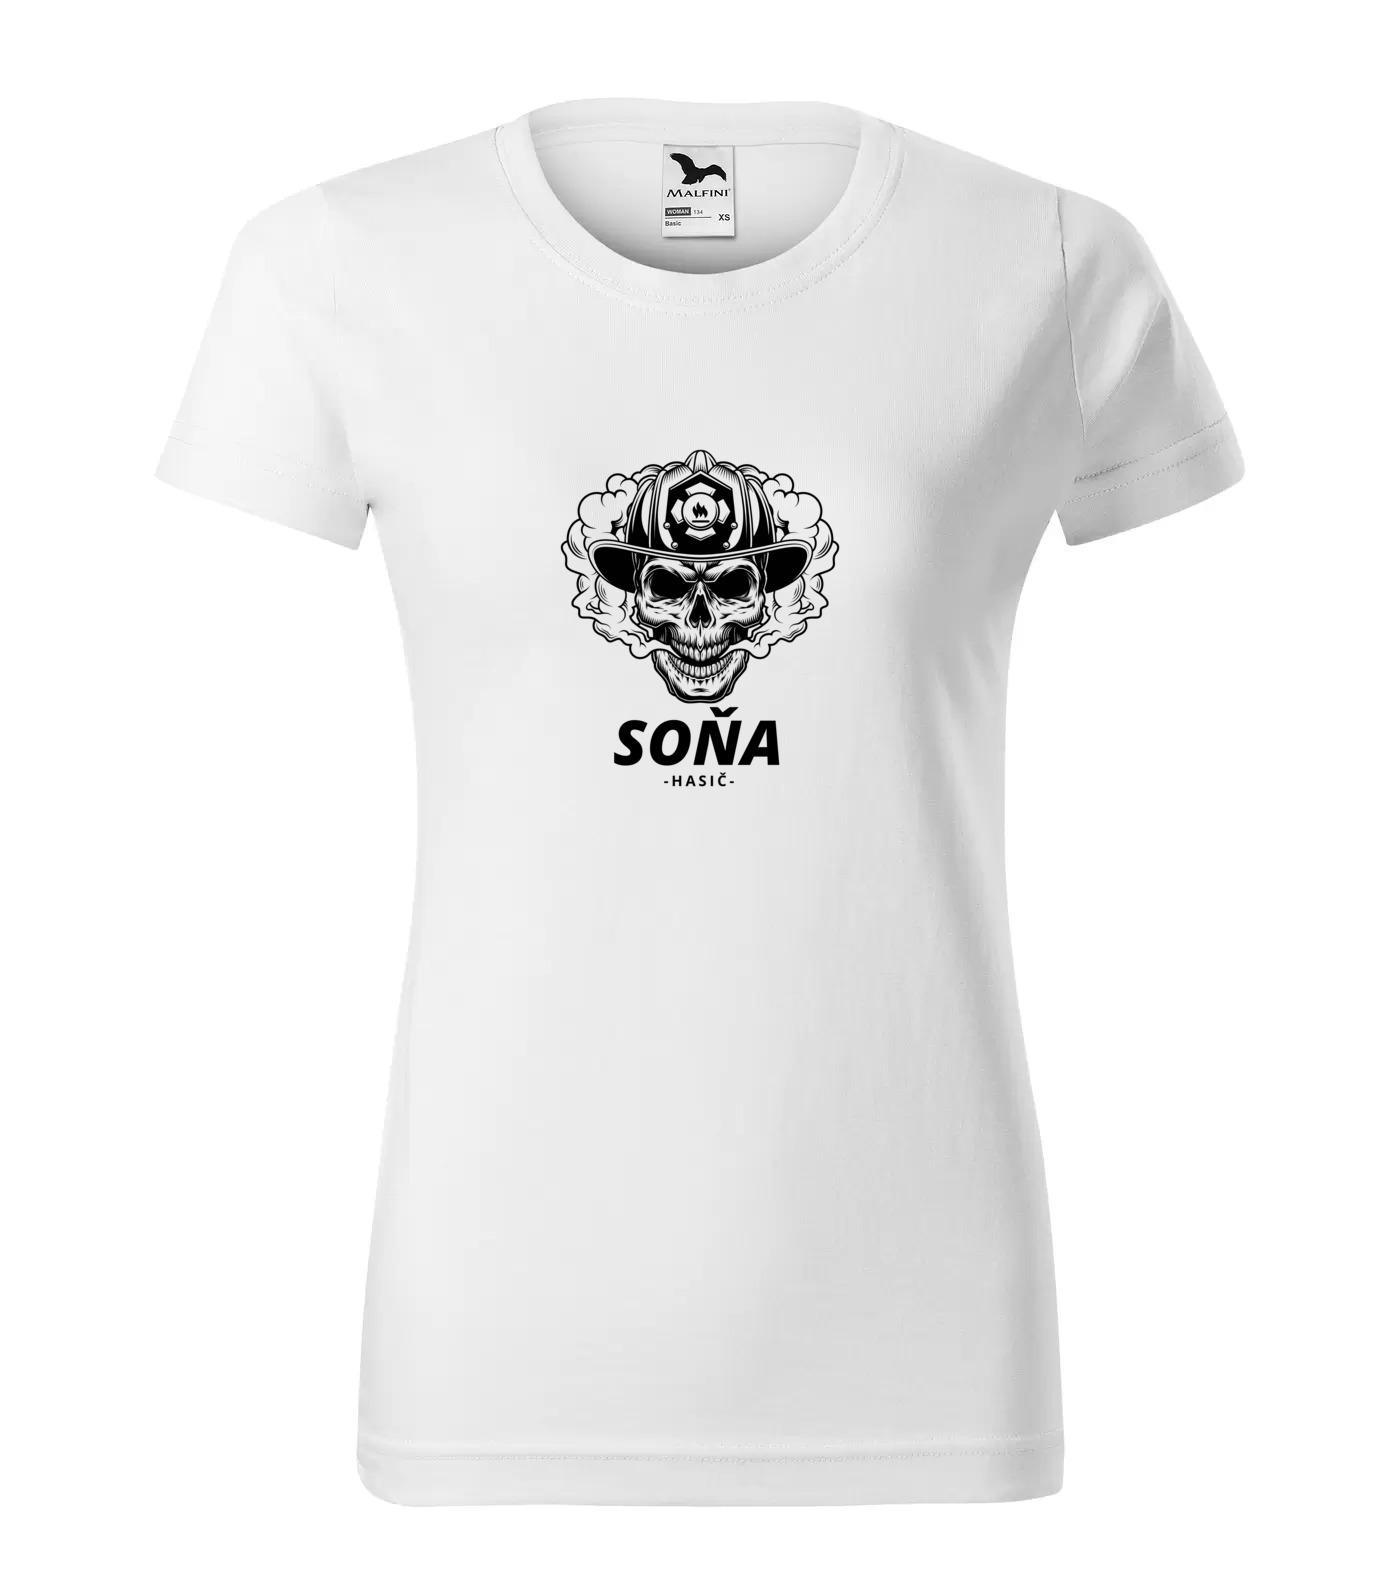 Tričko Hasič Soňa